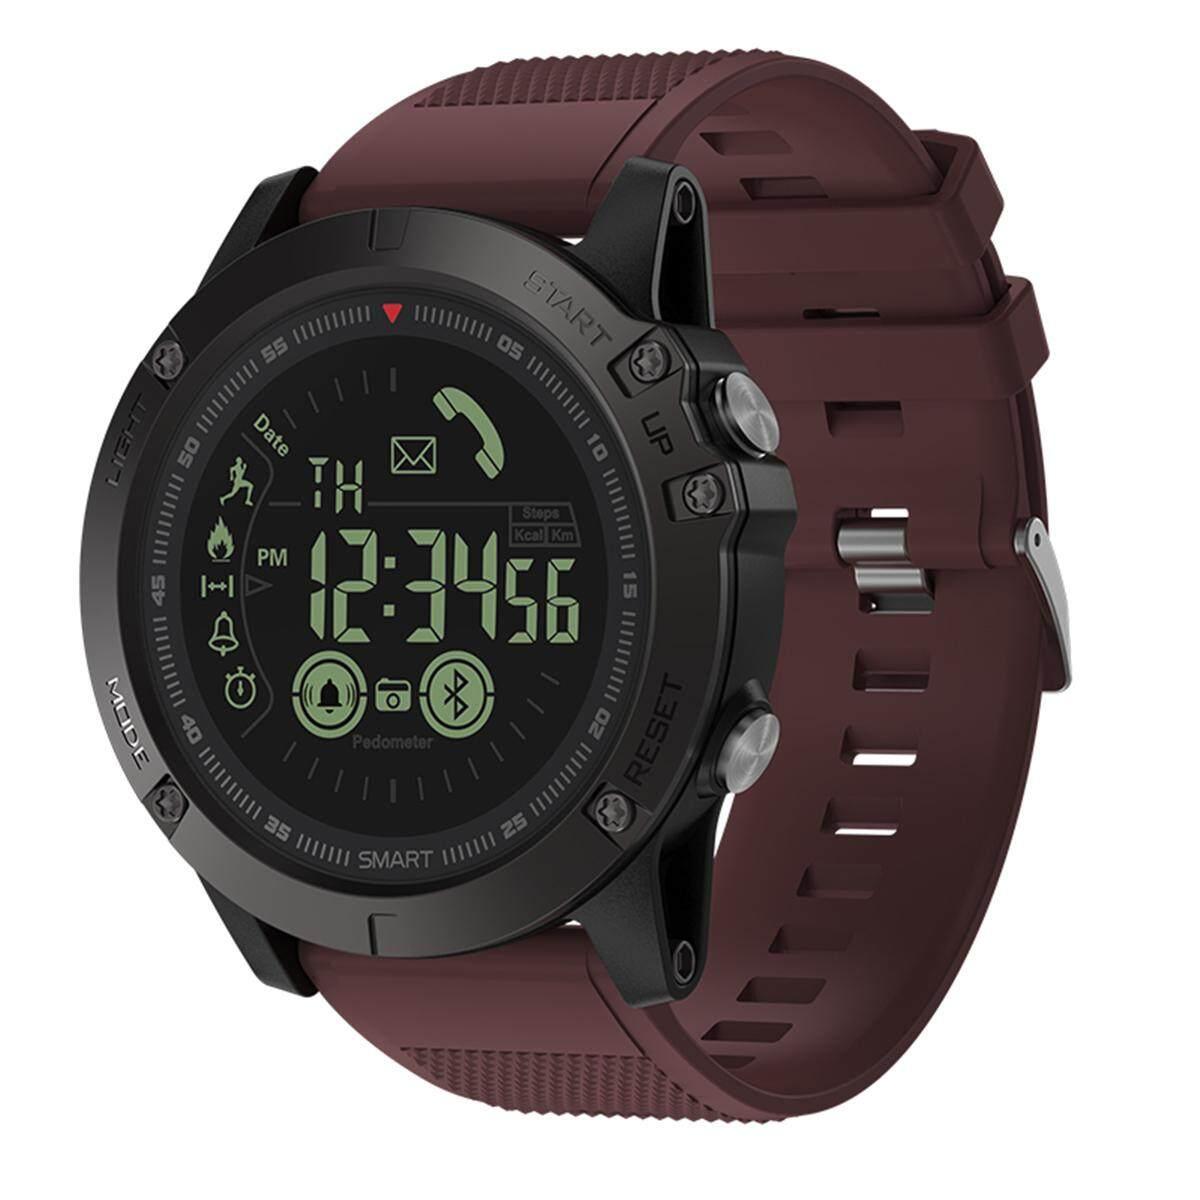 452adcc22 Zeblaze Vibe 3 Wrist Smart Watch Phone Alarm Mate Waterproof Camera Ios  Android Red Malaysia - Senarai Harga 2019